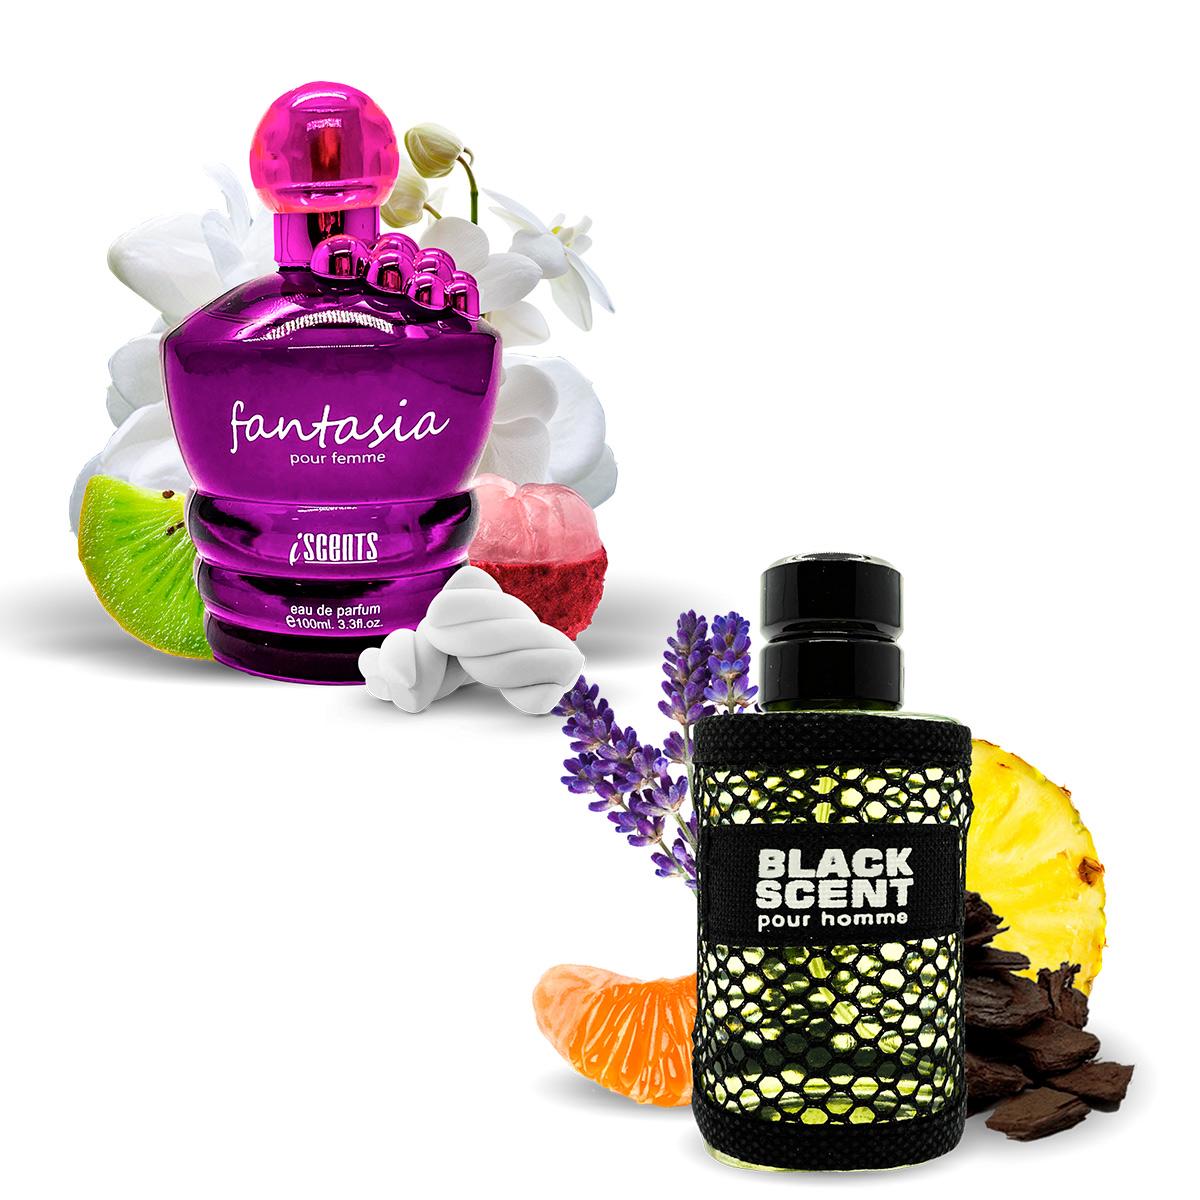 Kit 2 Perfumes Importados Fantasia e Black Scent I Scents